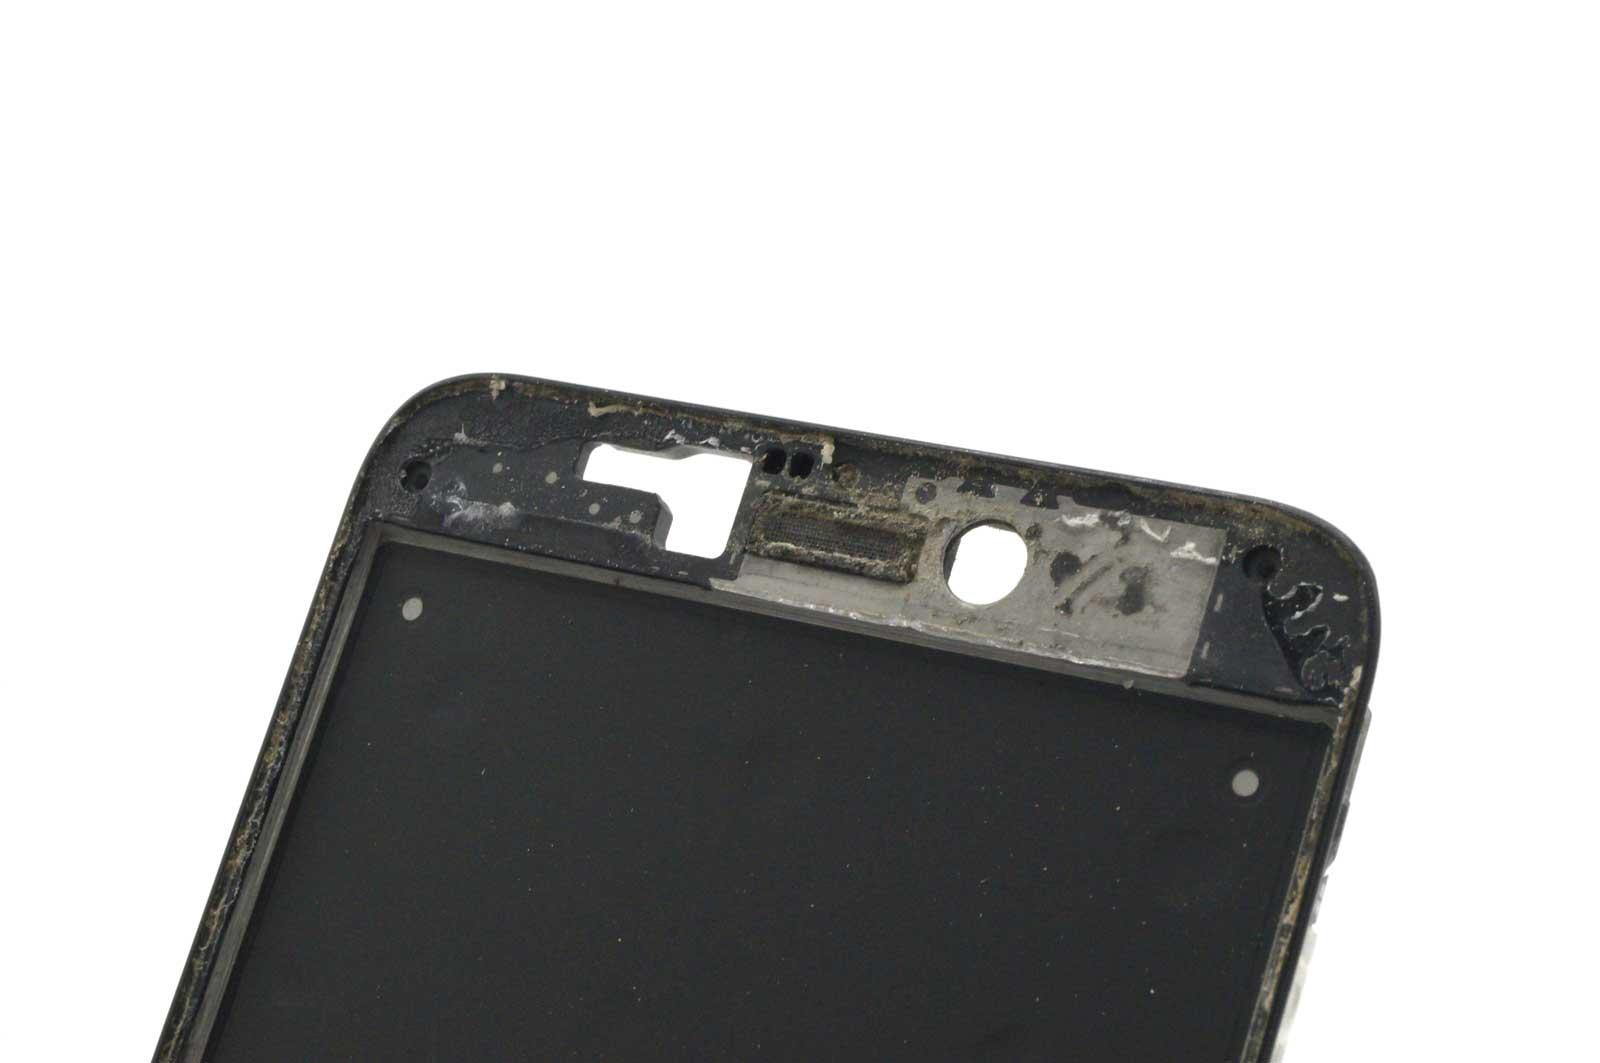 Установка нового дисплея на Xiaomi Redmi 4X